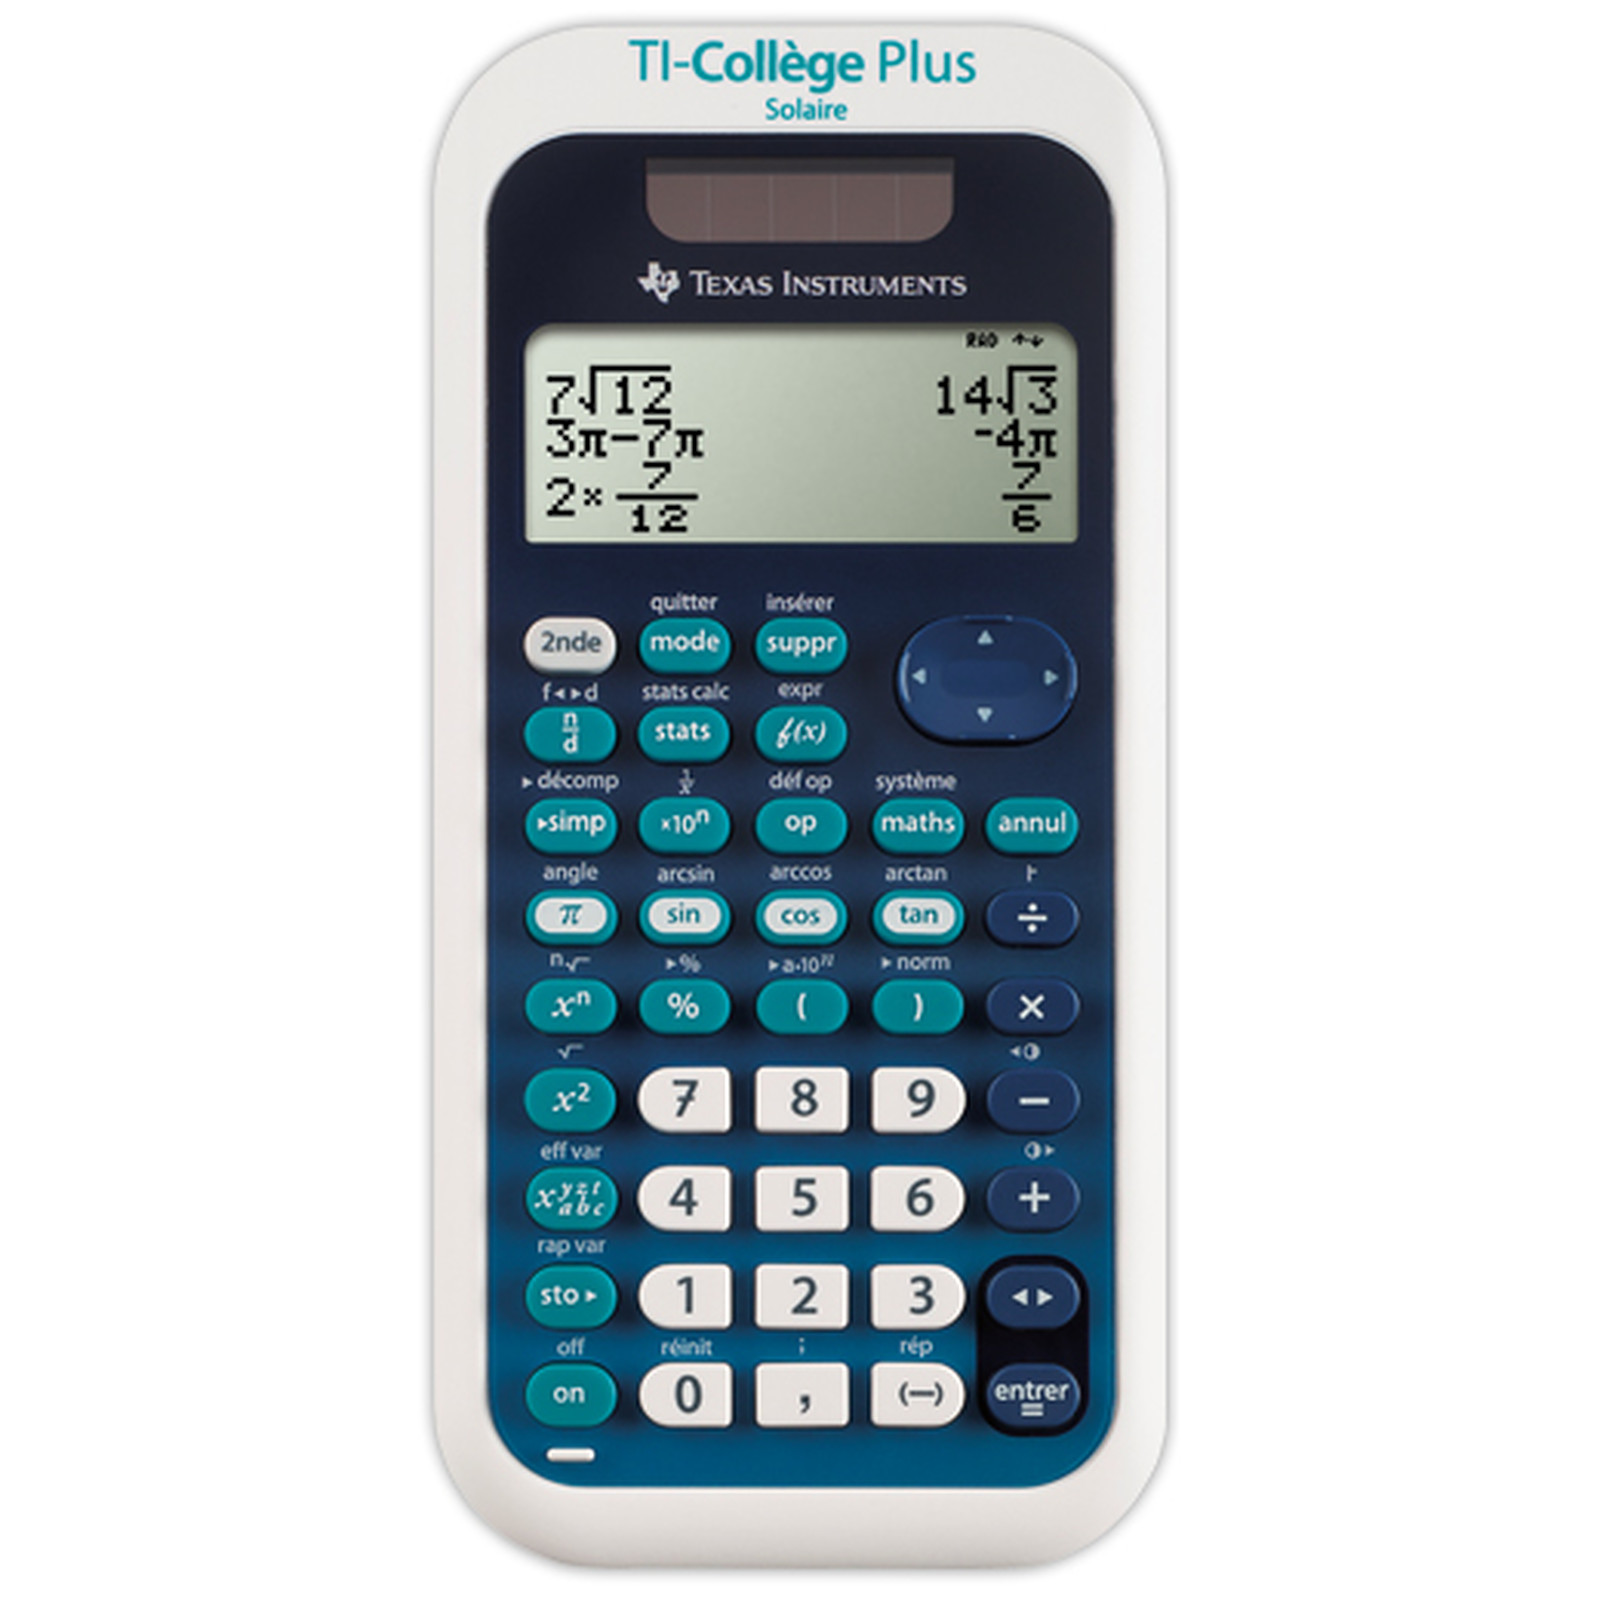 Texas Instruments TI Collège Plus Solaire